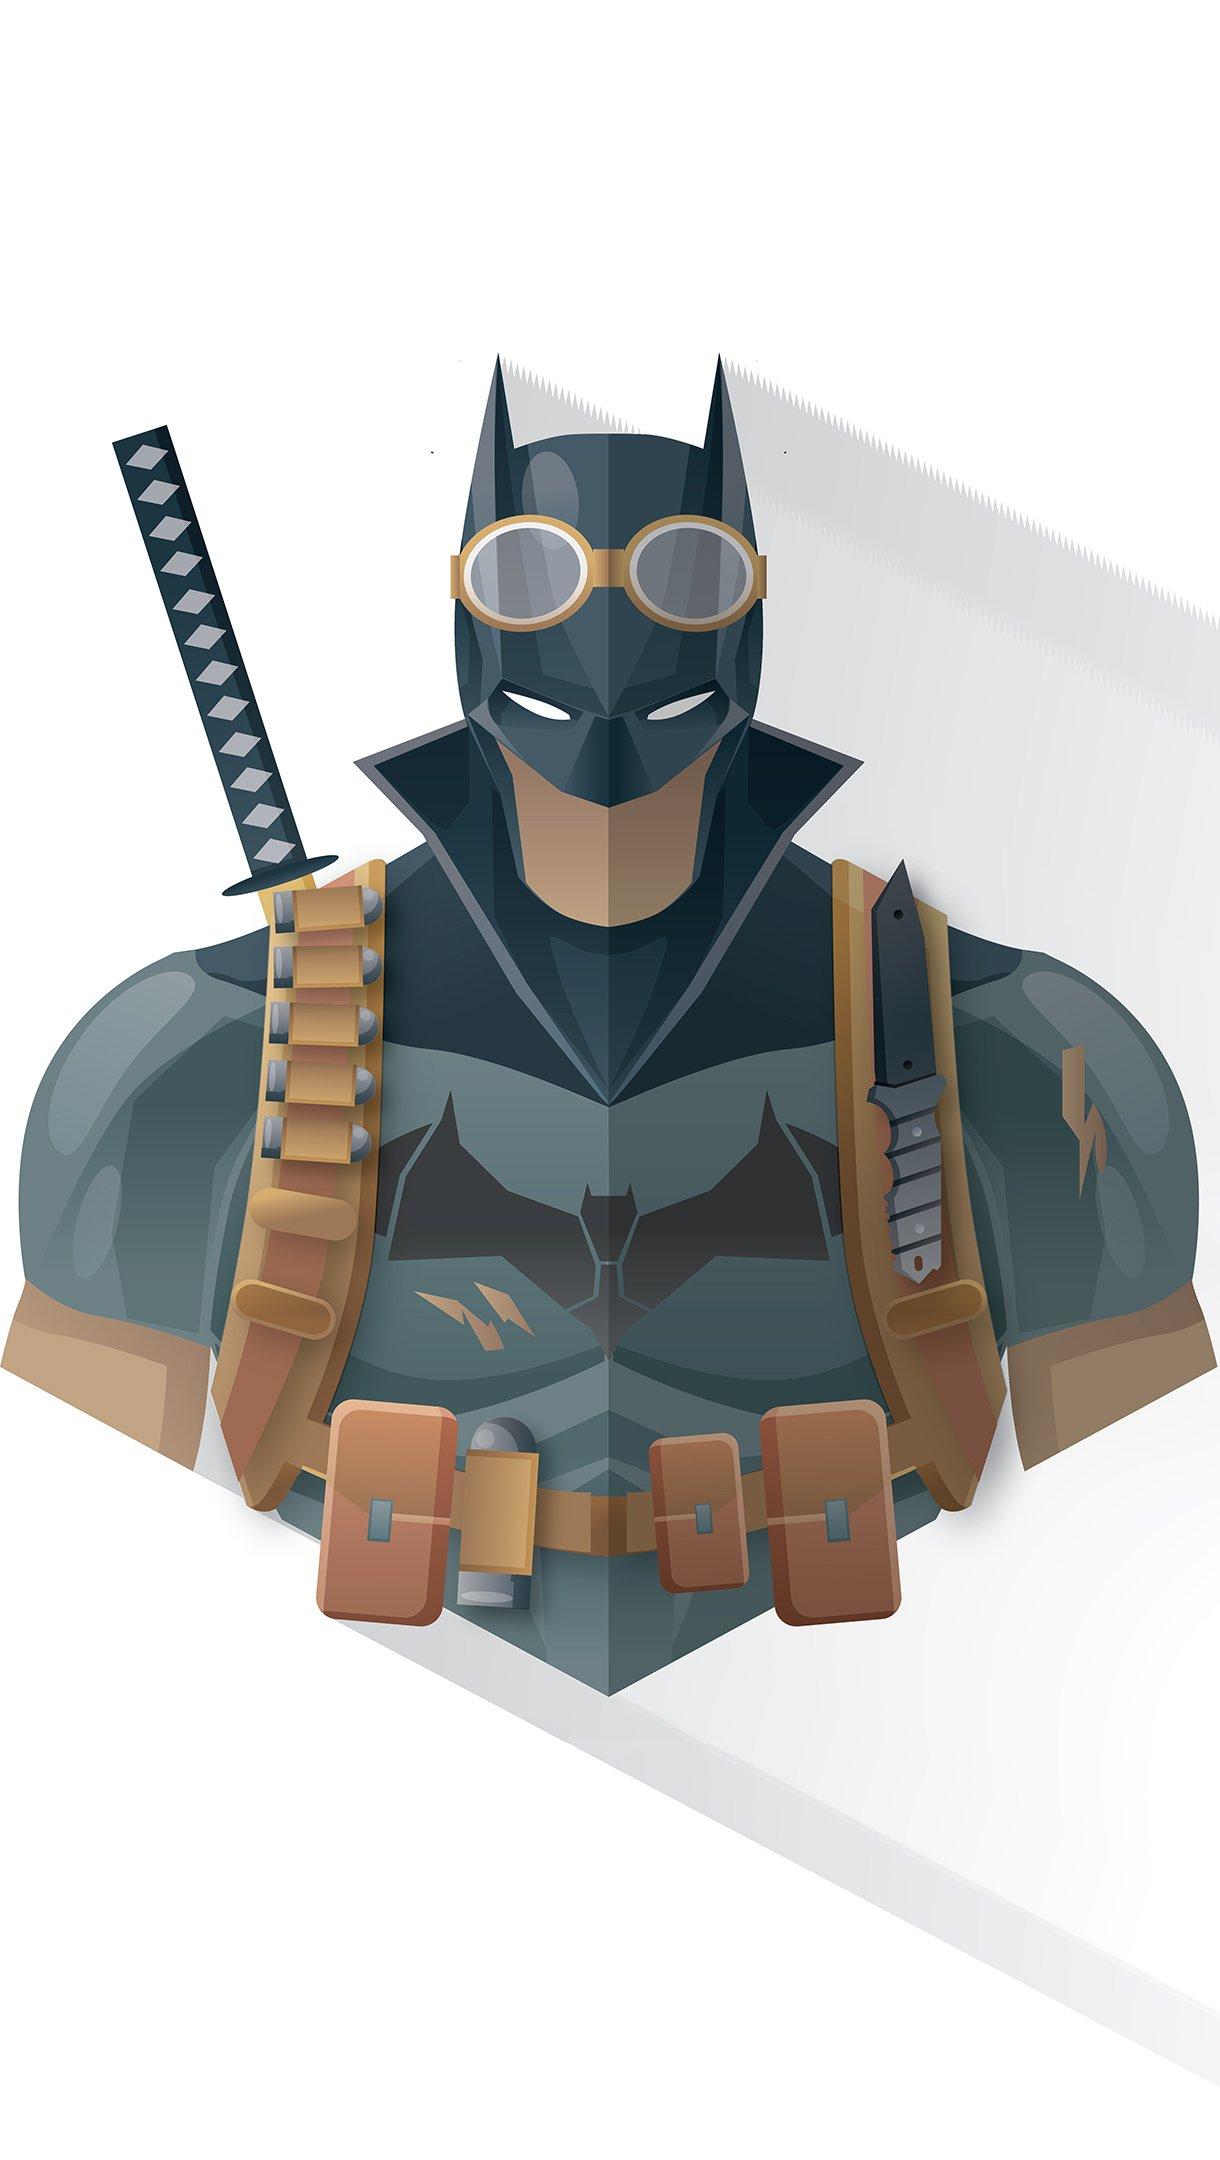 Wallpaper Batman Minimalist Illustration Vertical